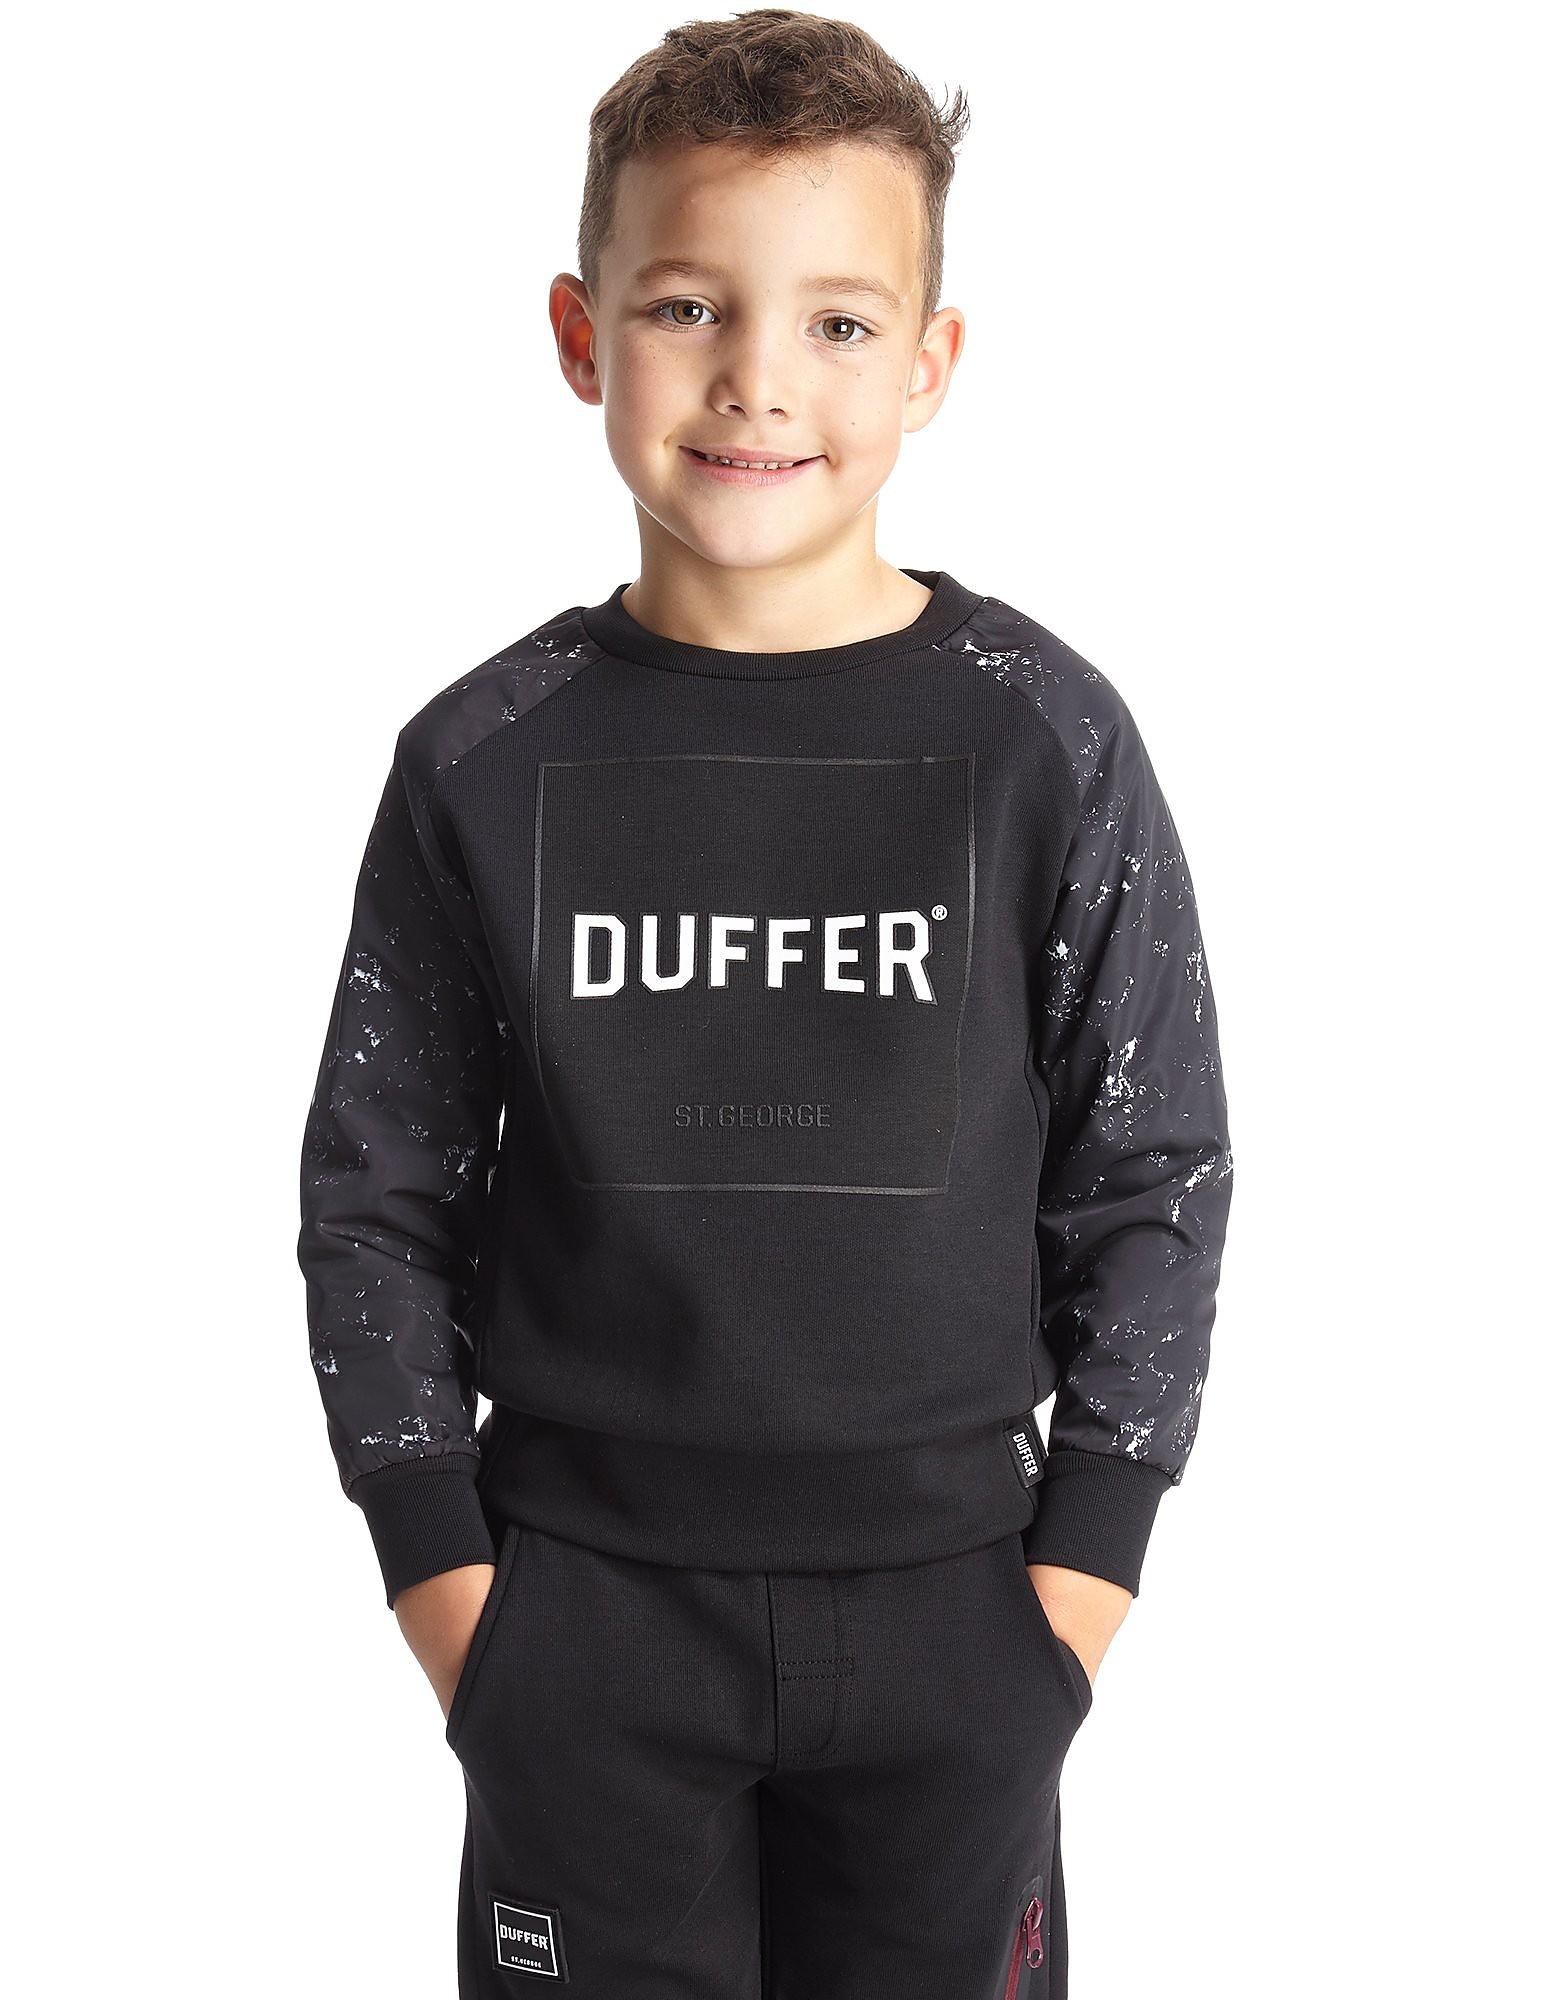 Duffer of St George West Crew Neck Sweatshirt Children